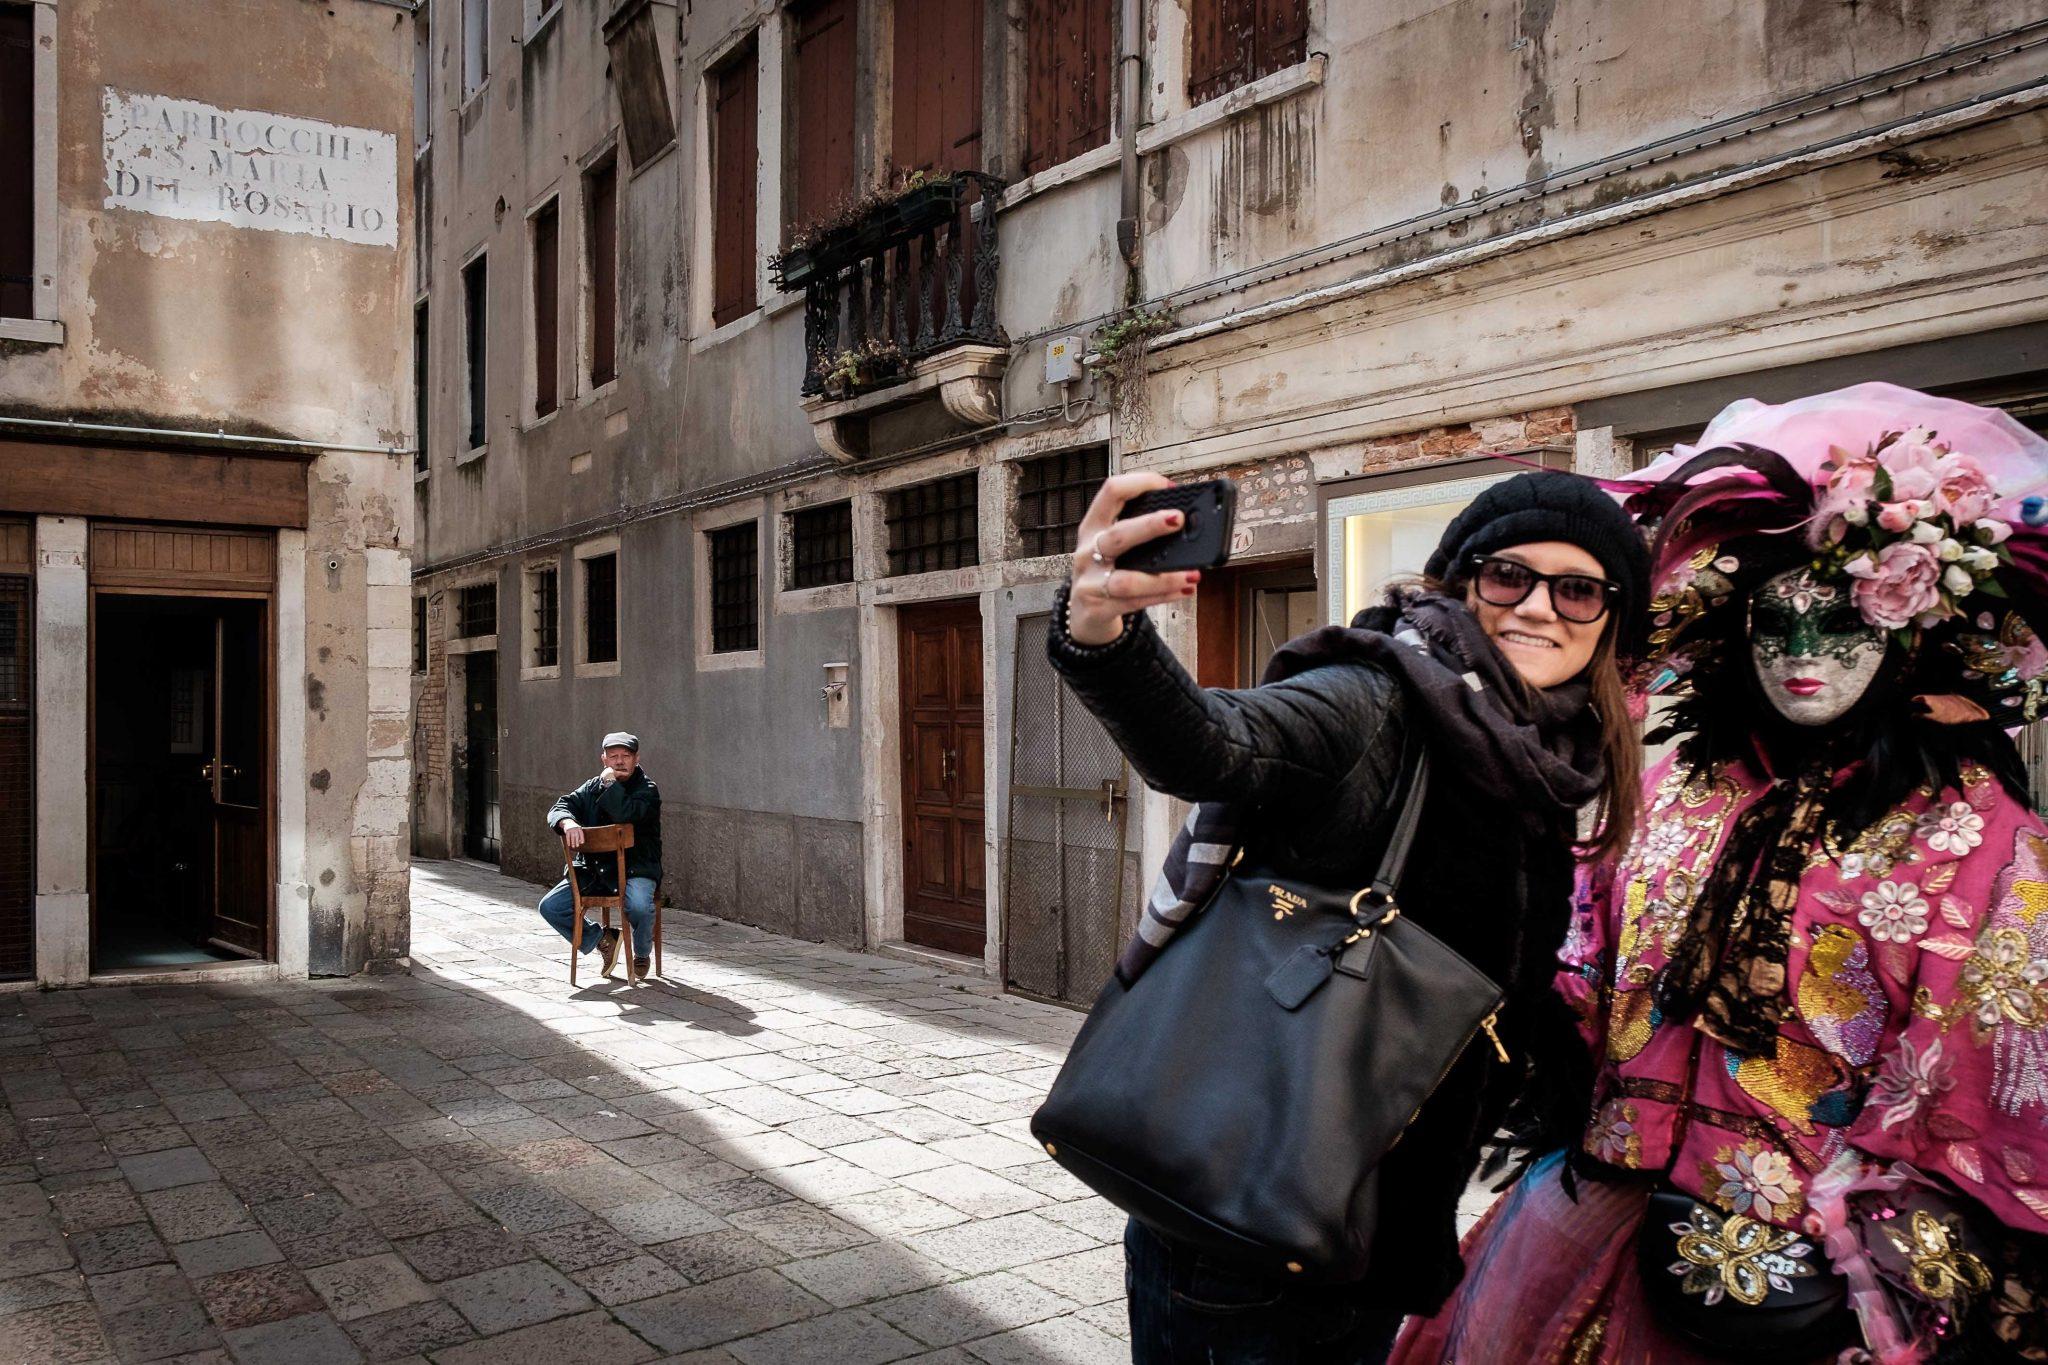 Carnevale Venezia - Street Photography